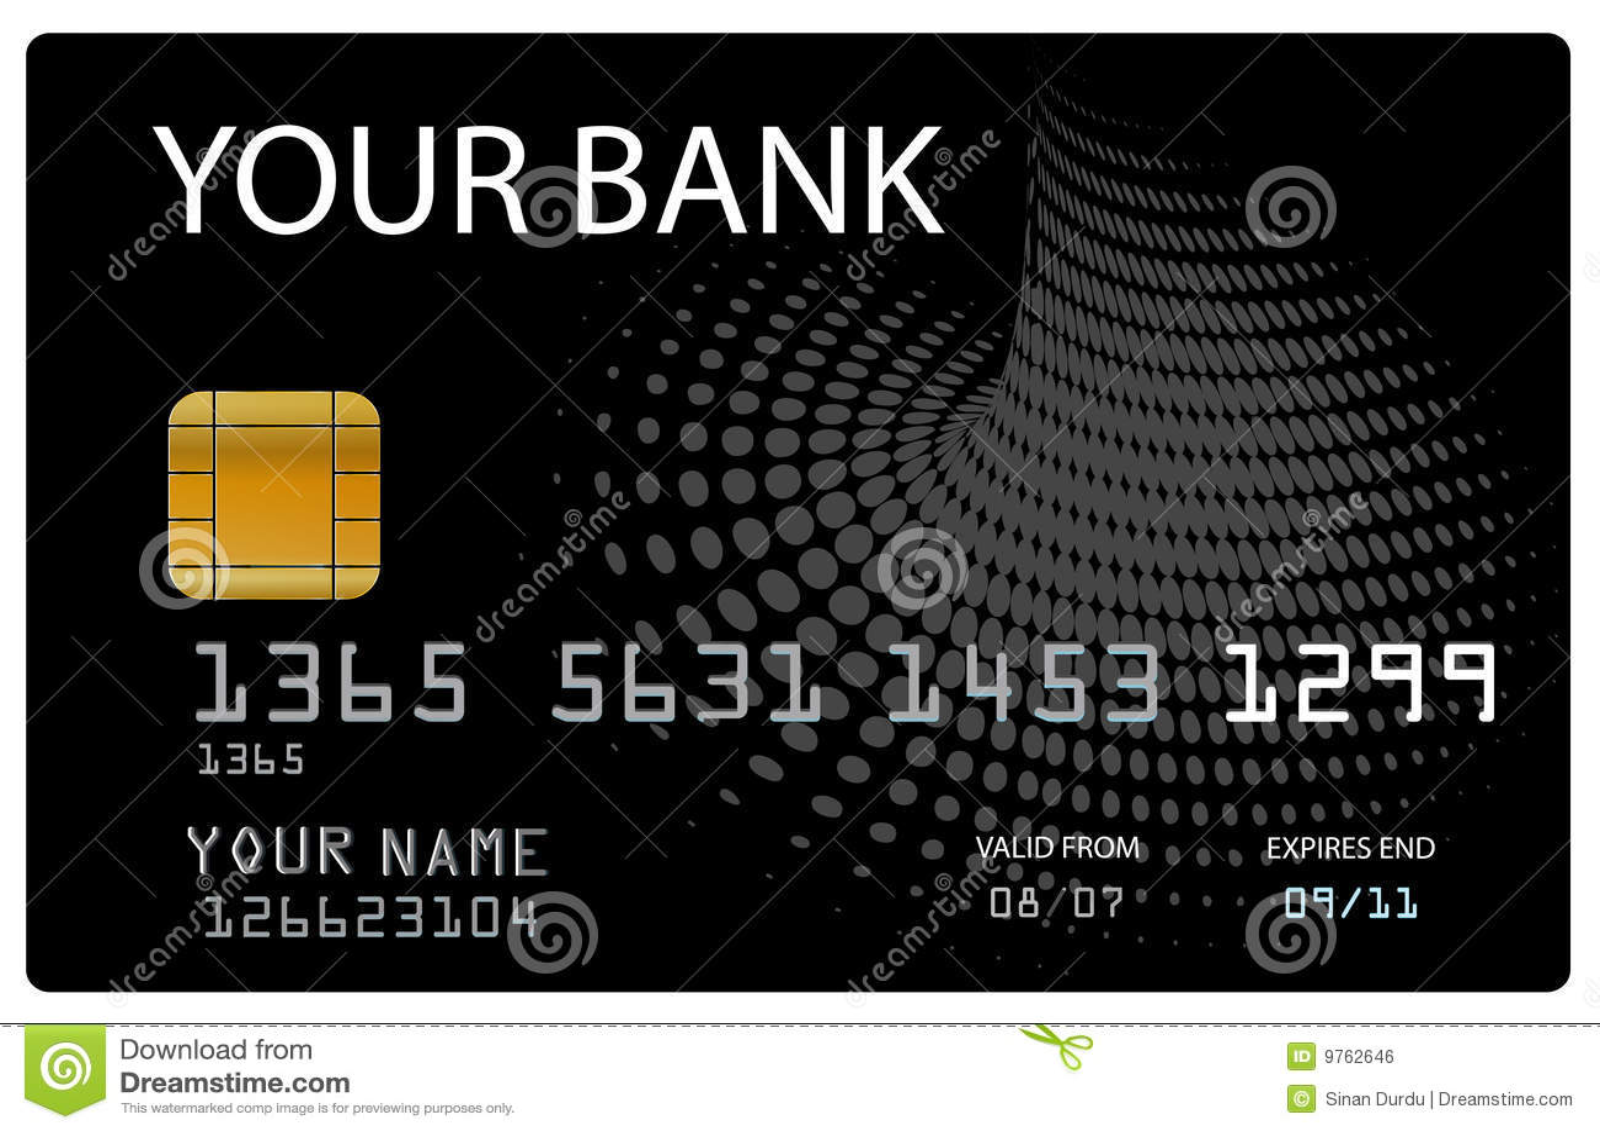 Din kontokortkreditering